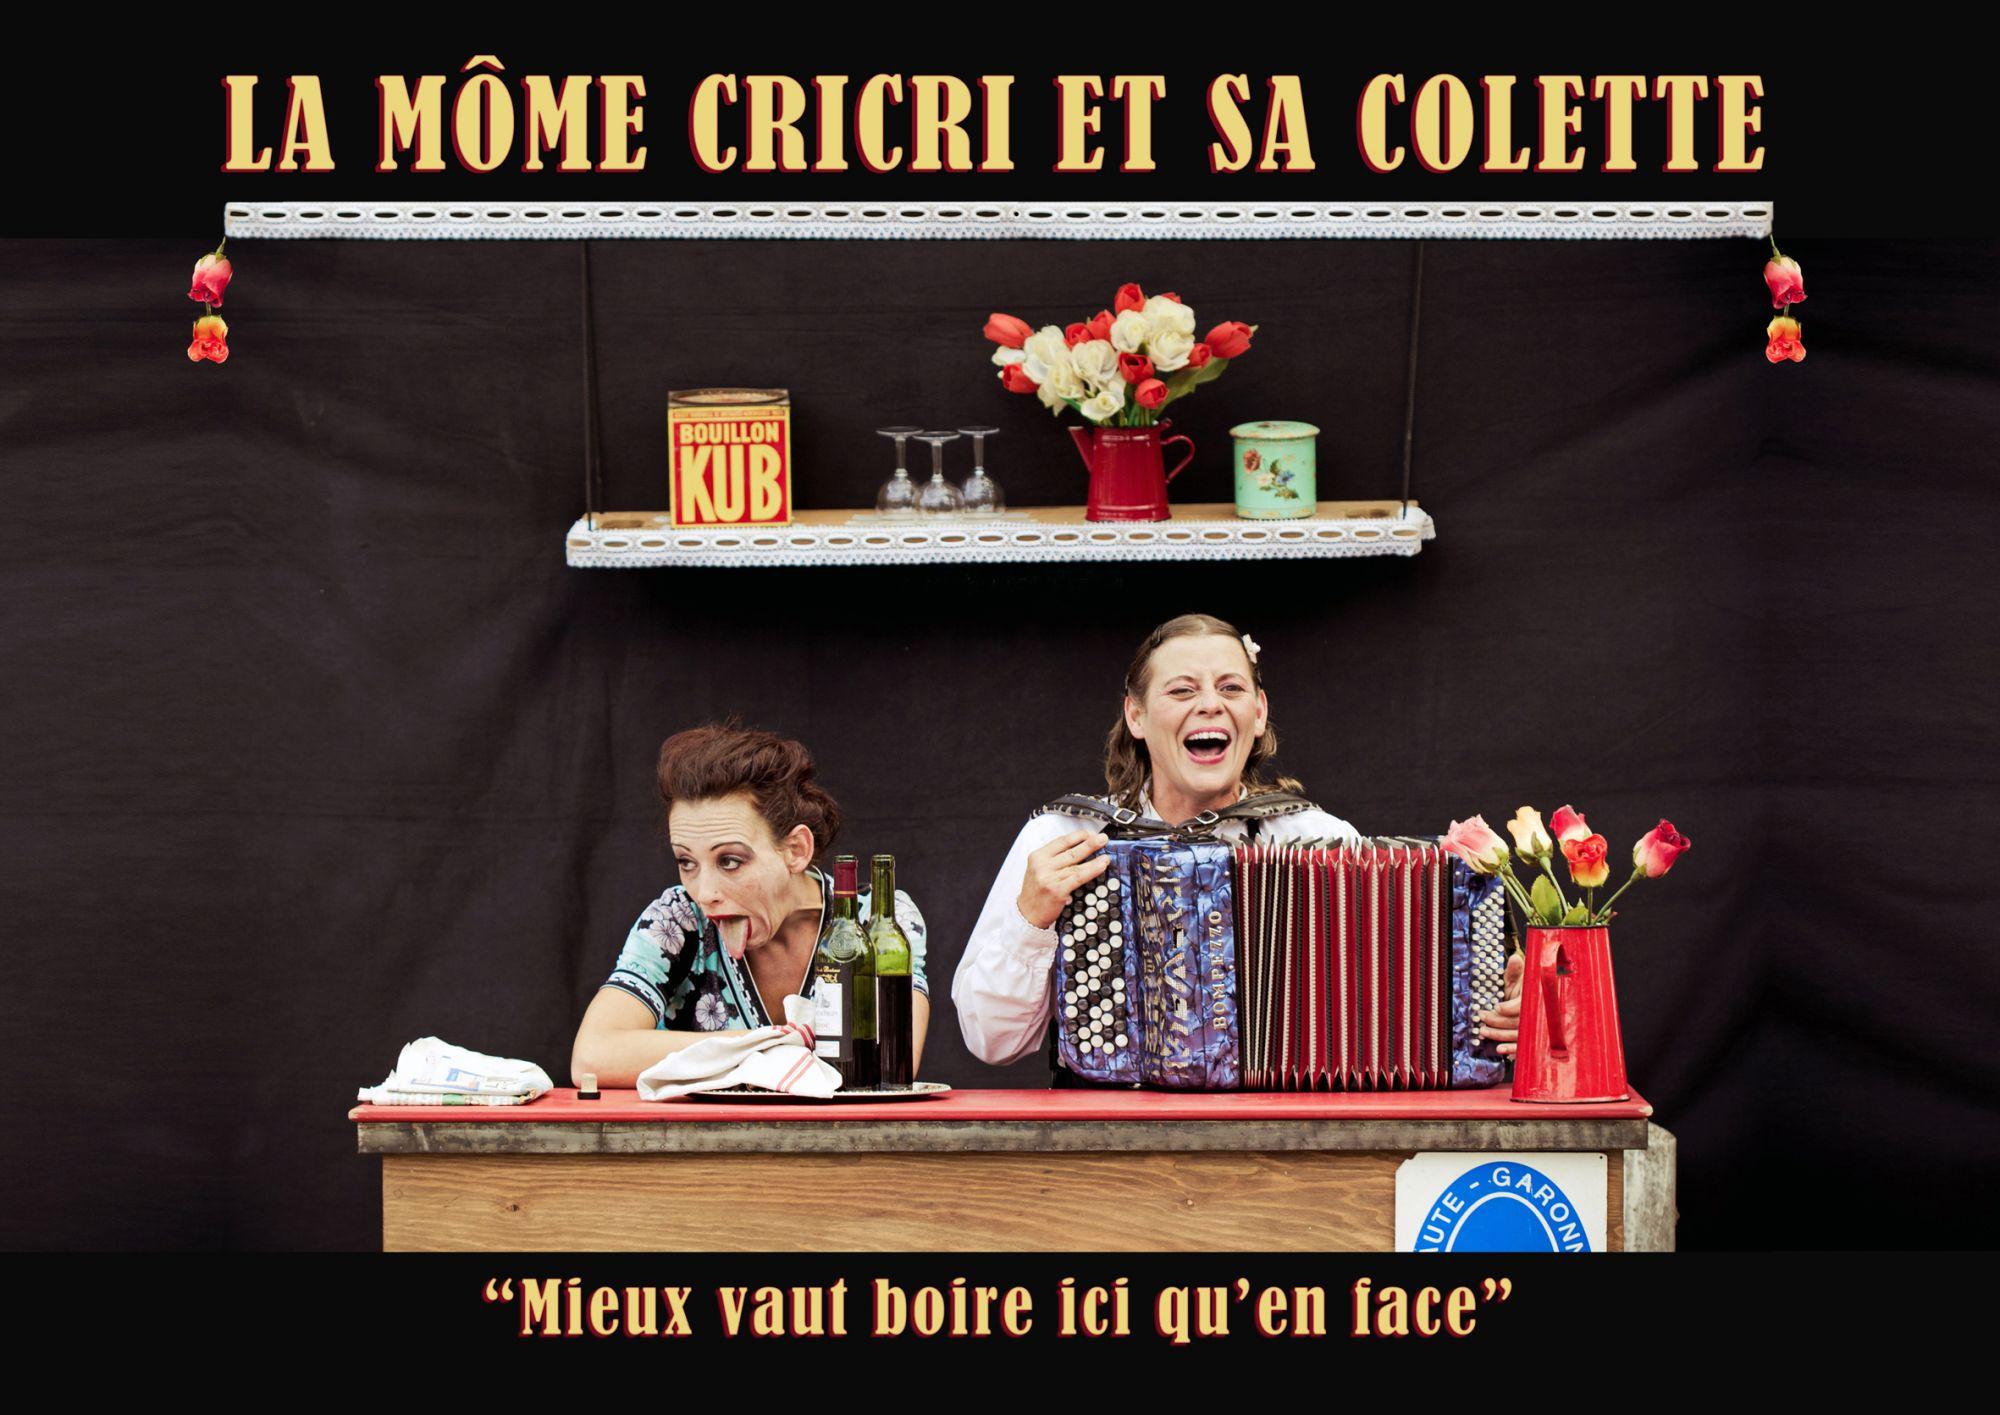 Festival 2018 Môme-Cricri-et-sa-Colette